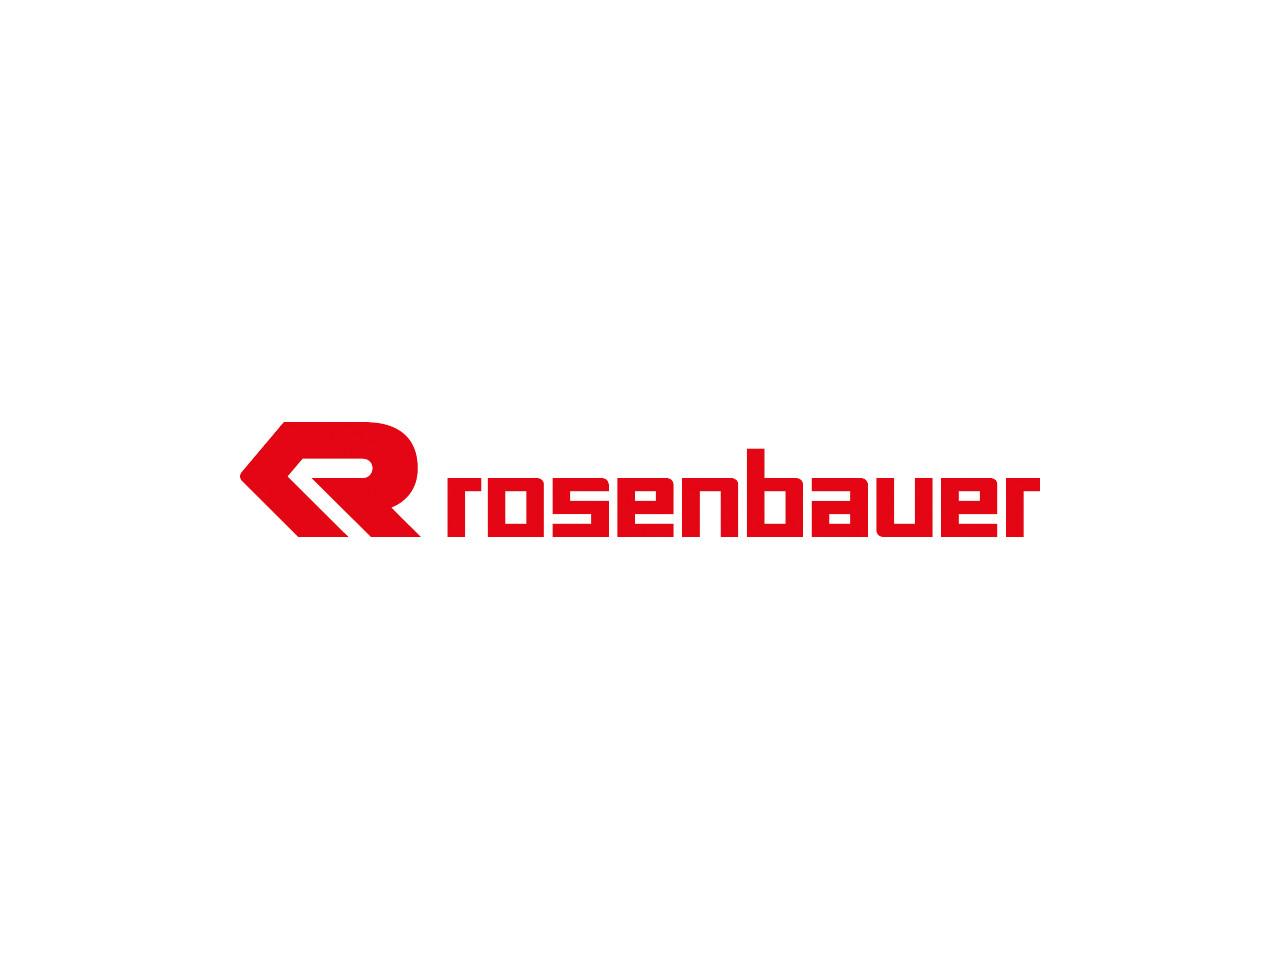 rosenbauer-10